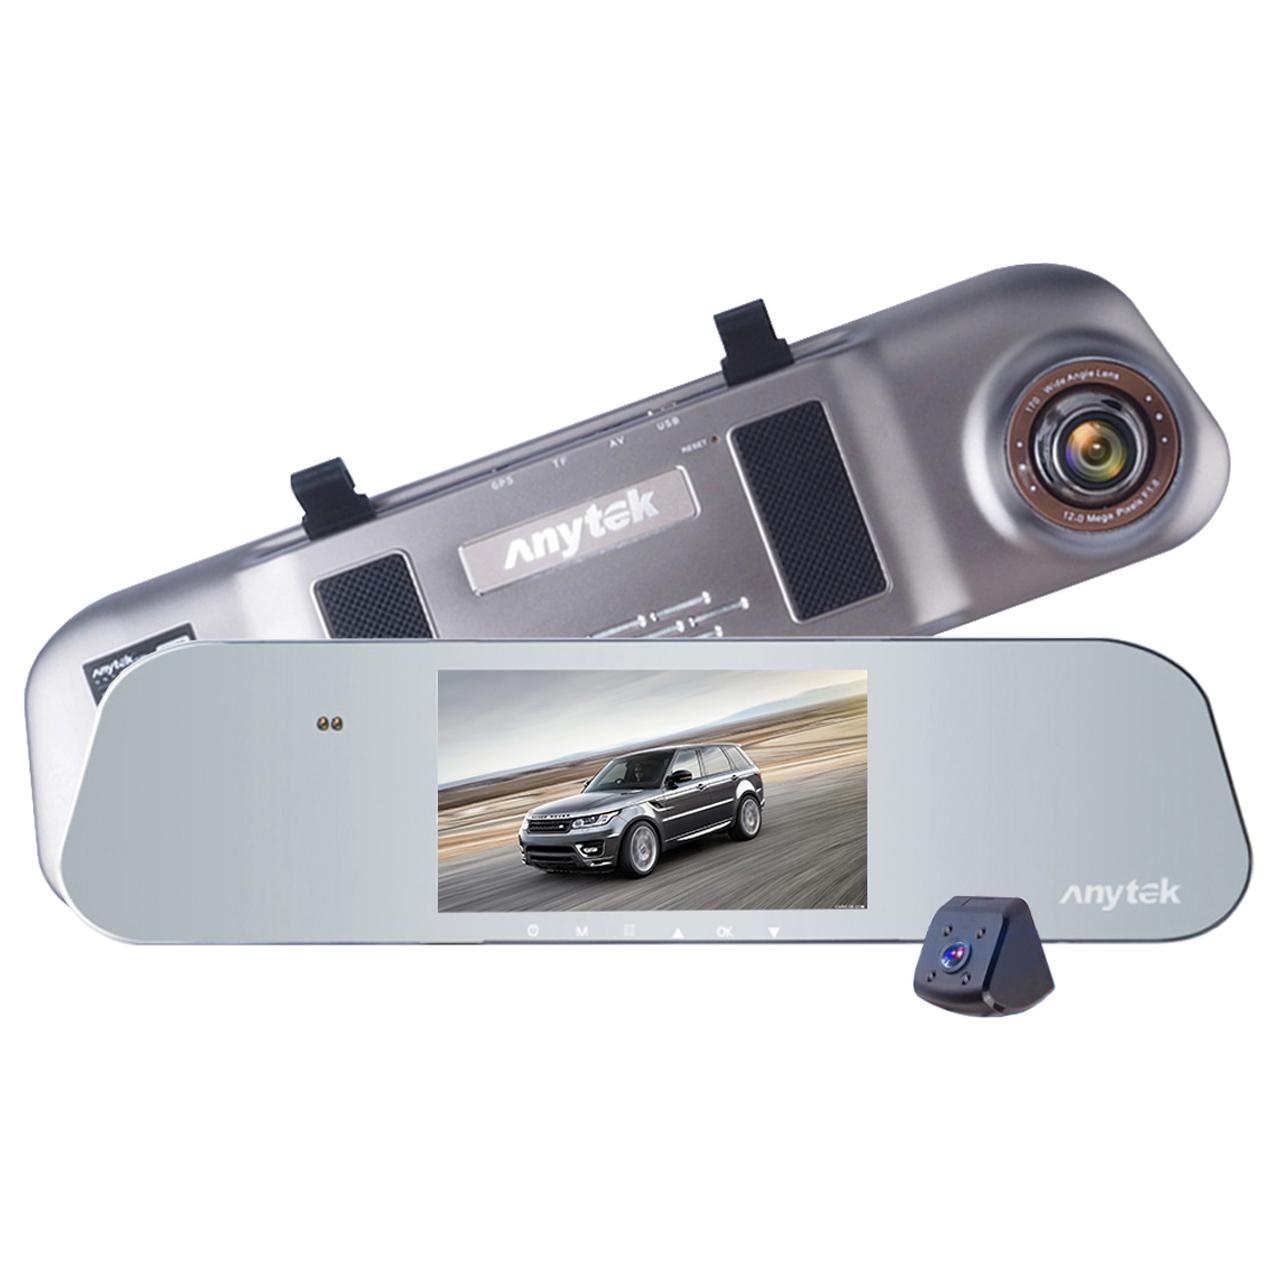 دوربين فيلم برداري خودرو AnyTek مدل A80 Plus